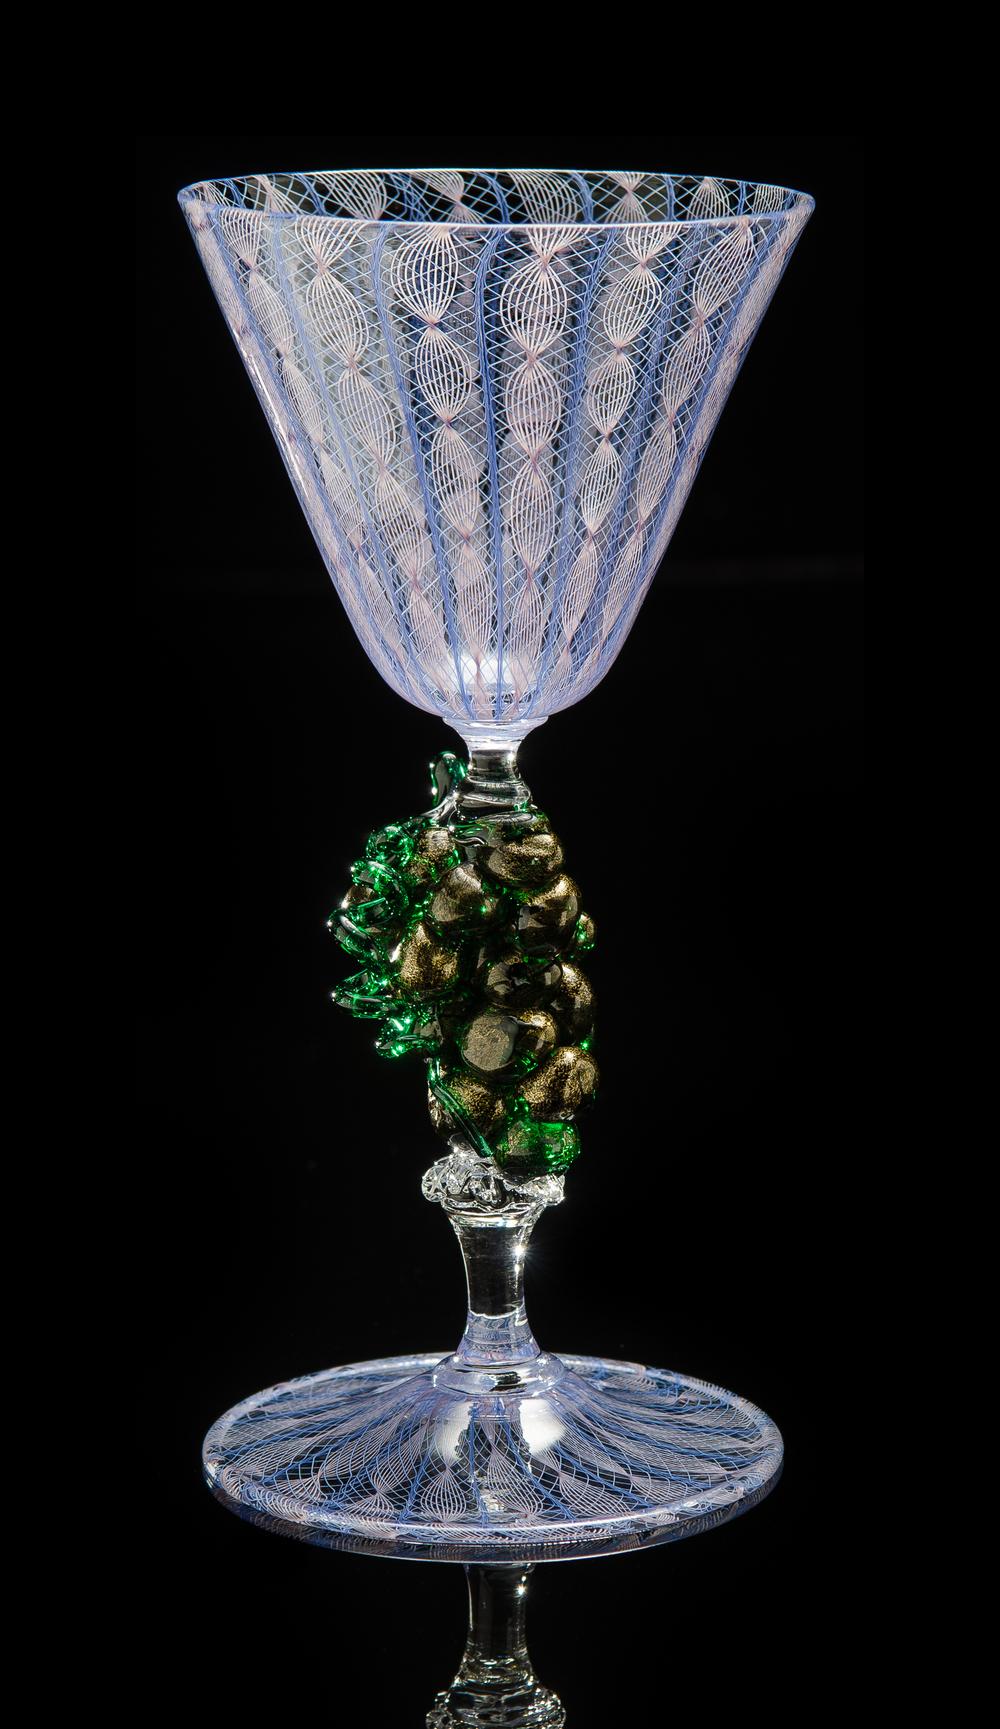 Lino Tagliapietra, Goblet (1991-1994, glass, 7 3/4 x 3 3/4 x 3 3/4 inches), LT.87